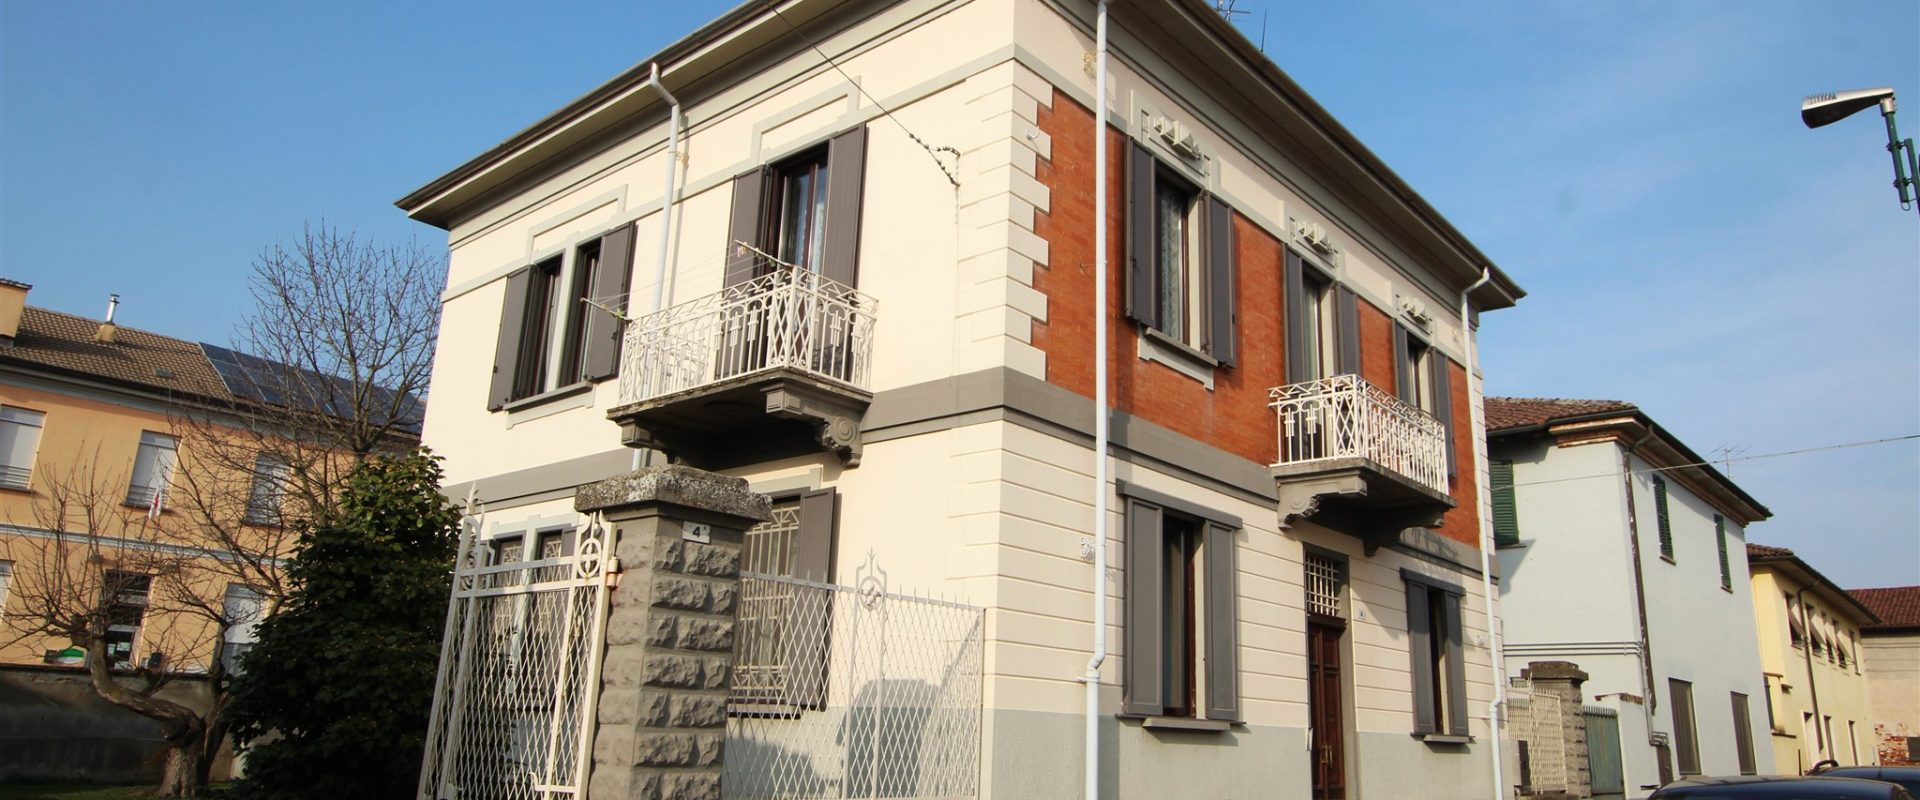 Villa d'epoca a Casalino